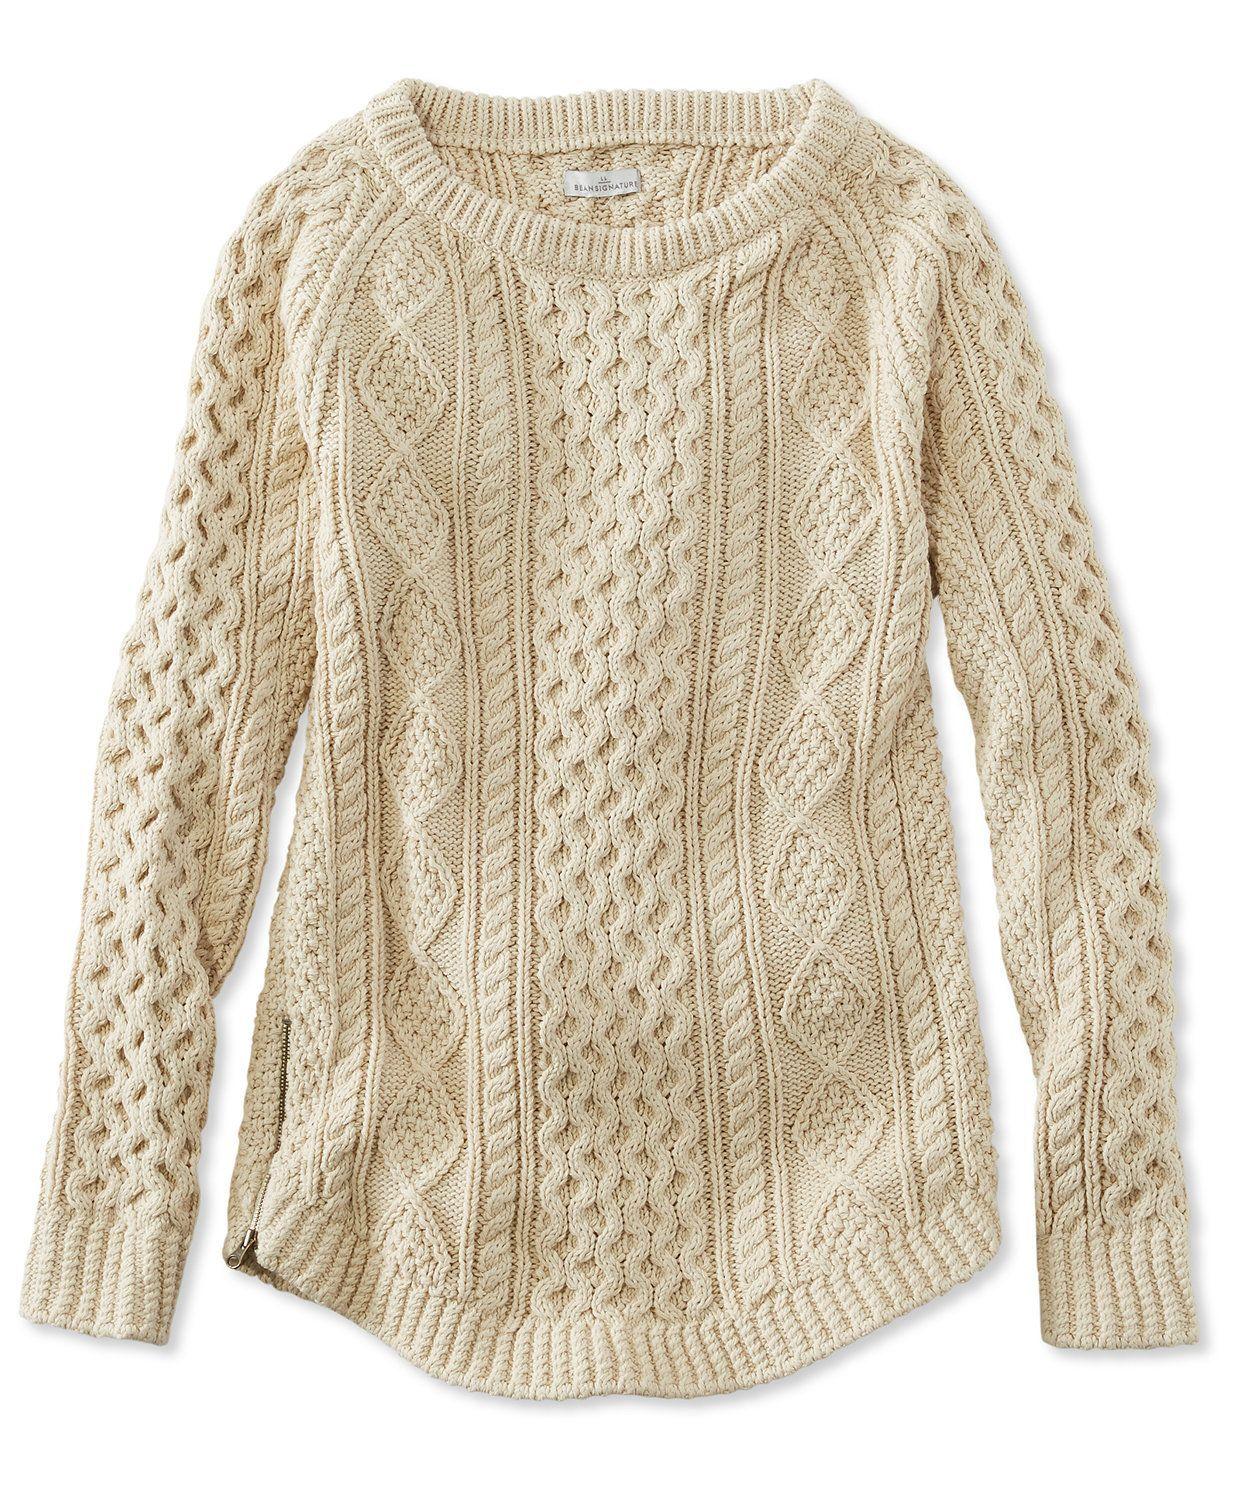 Signature Cotton Fisherman Tunic Sweater | Clothing | Pinterest ...